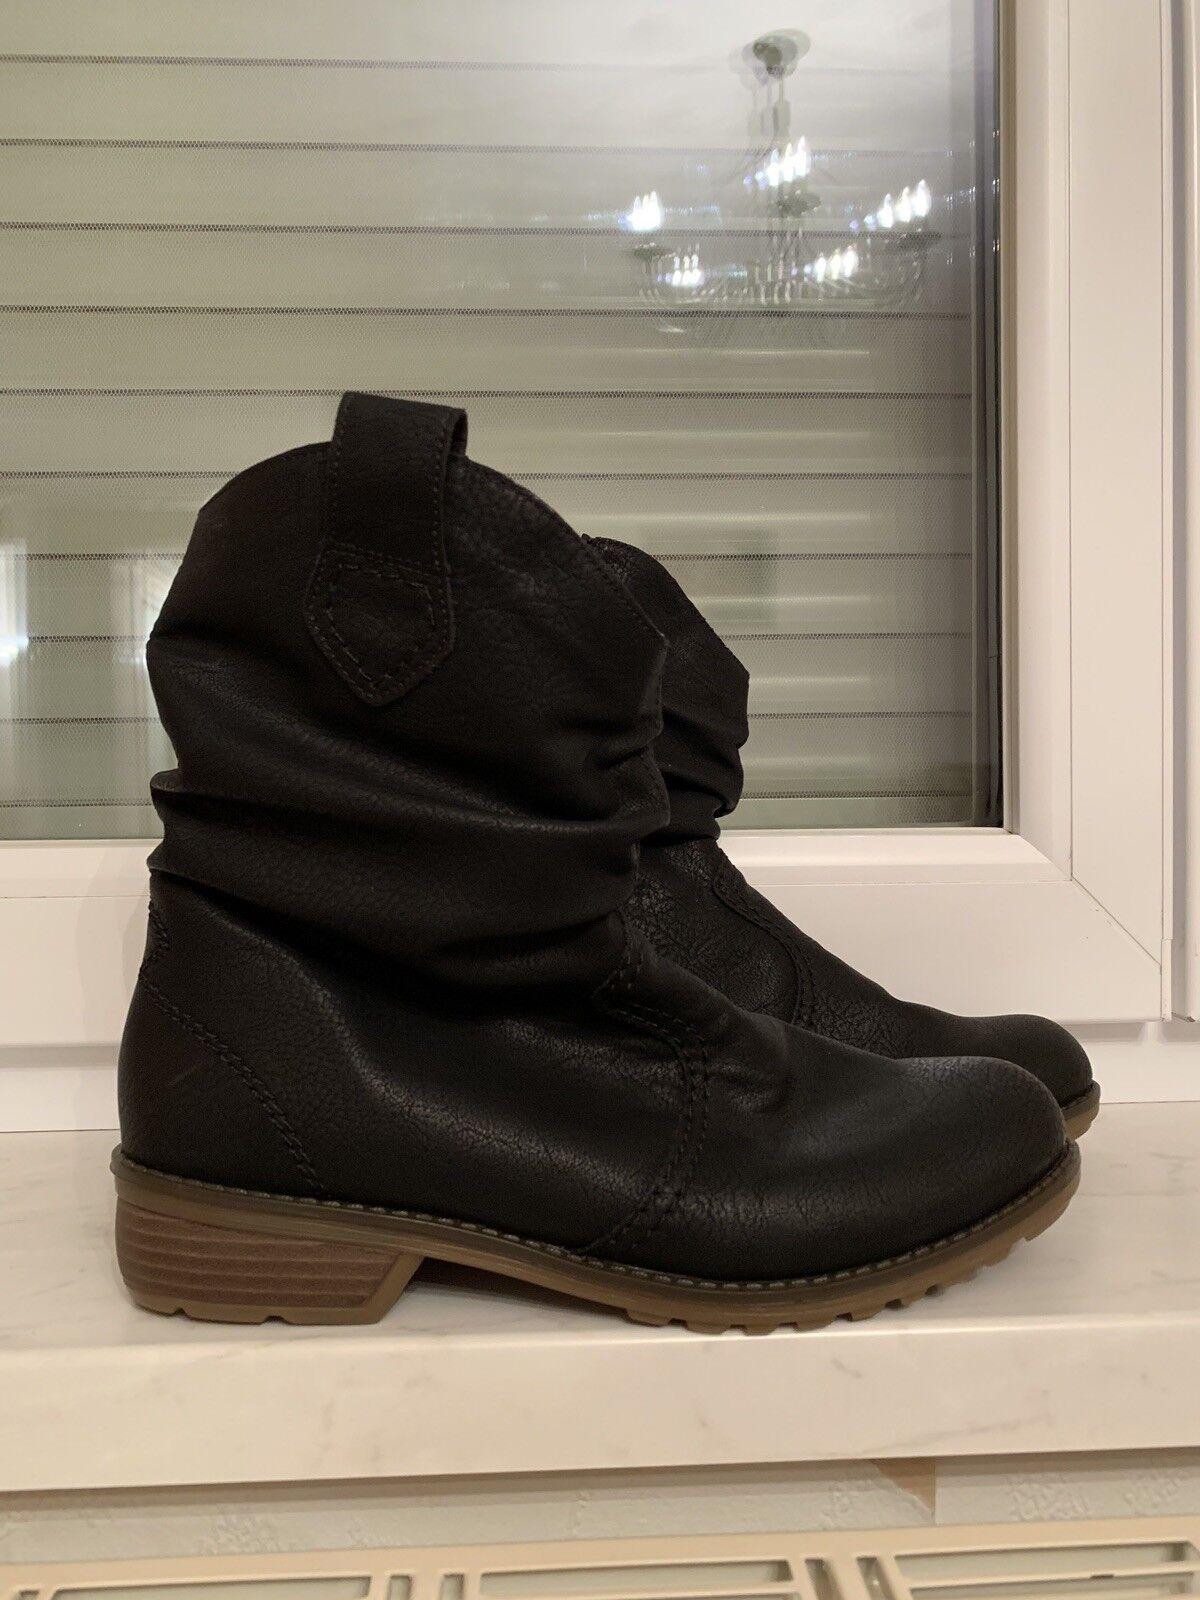 Rieker Stiefel Stiefeletten Boots Gefüttert Gefüttert Gefüttert Neu Black black Winter Gr 41 4068d3